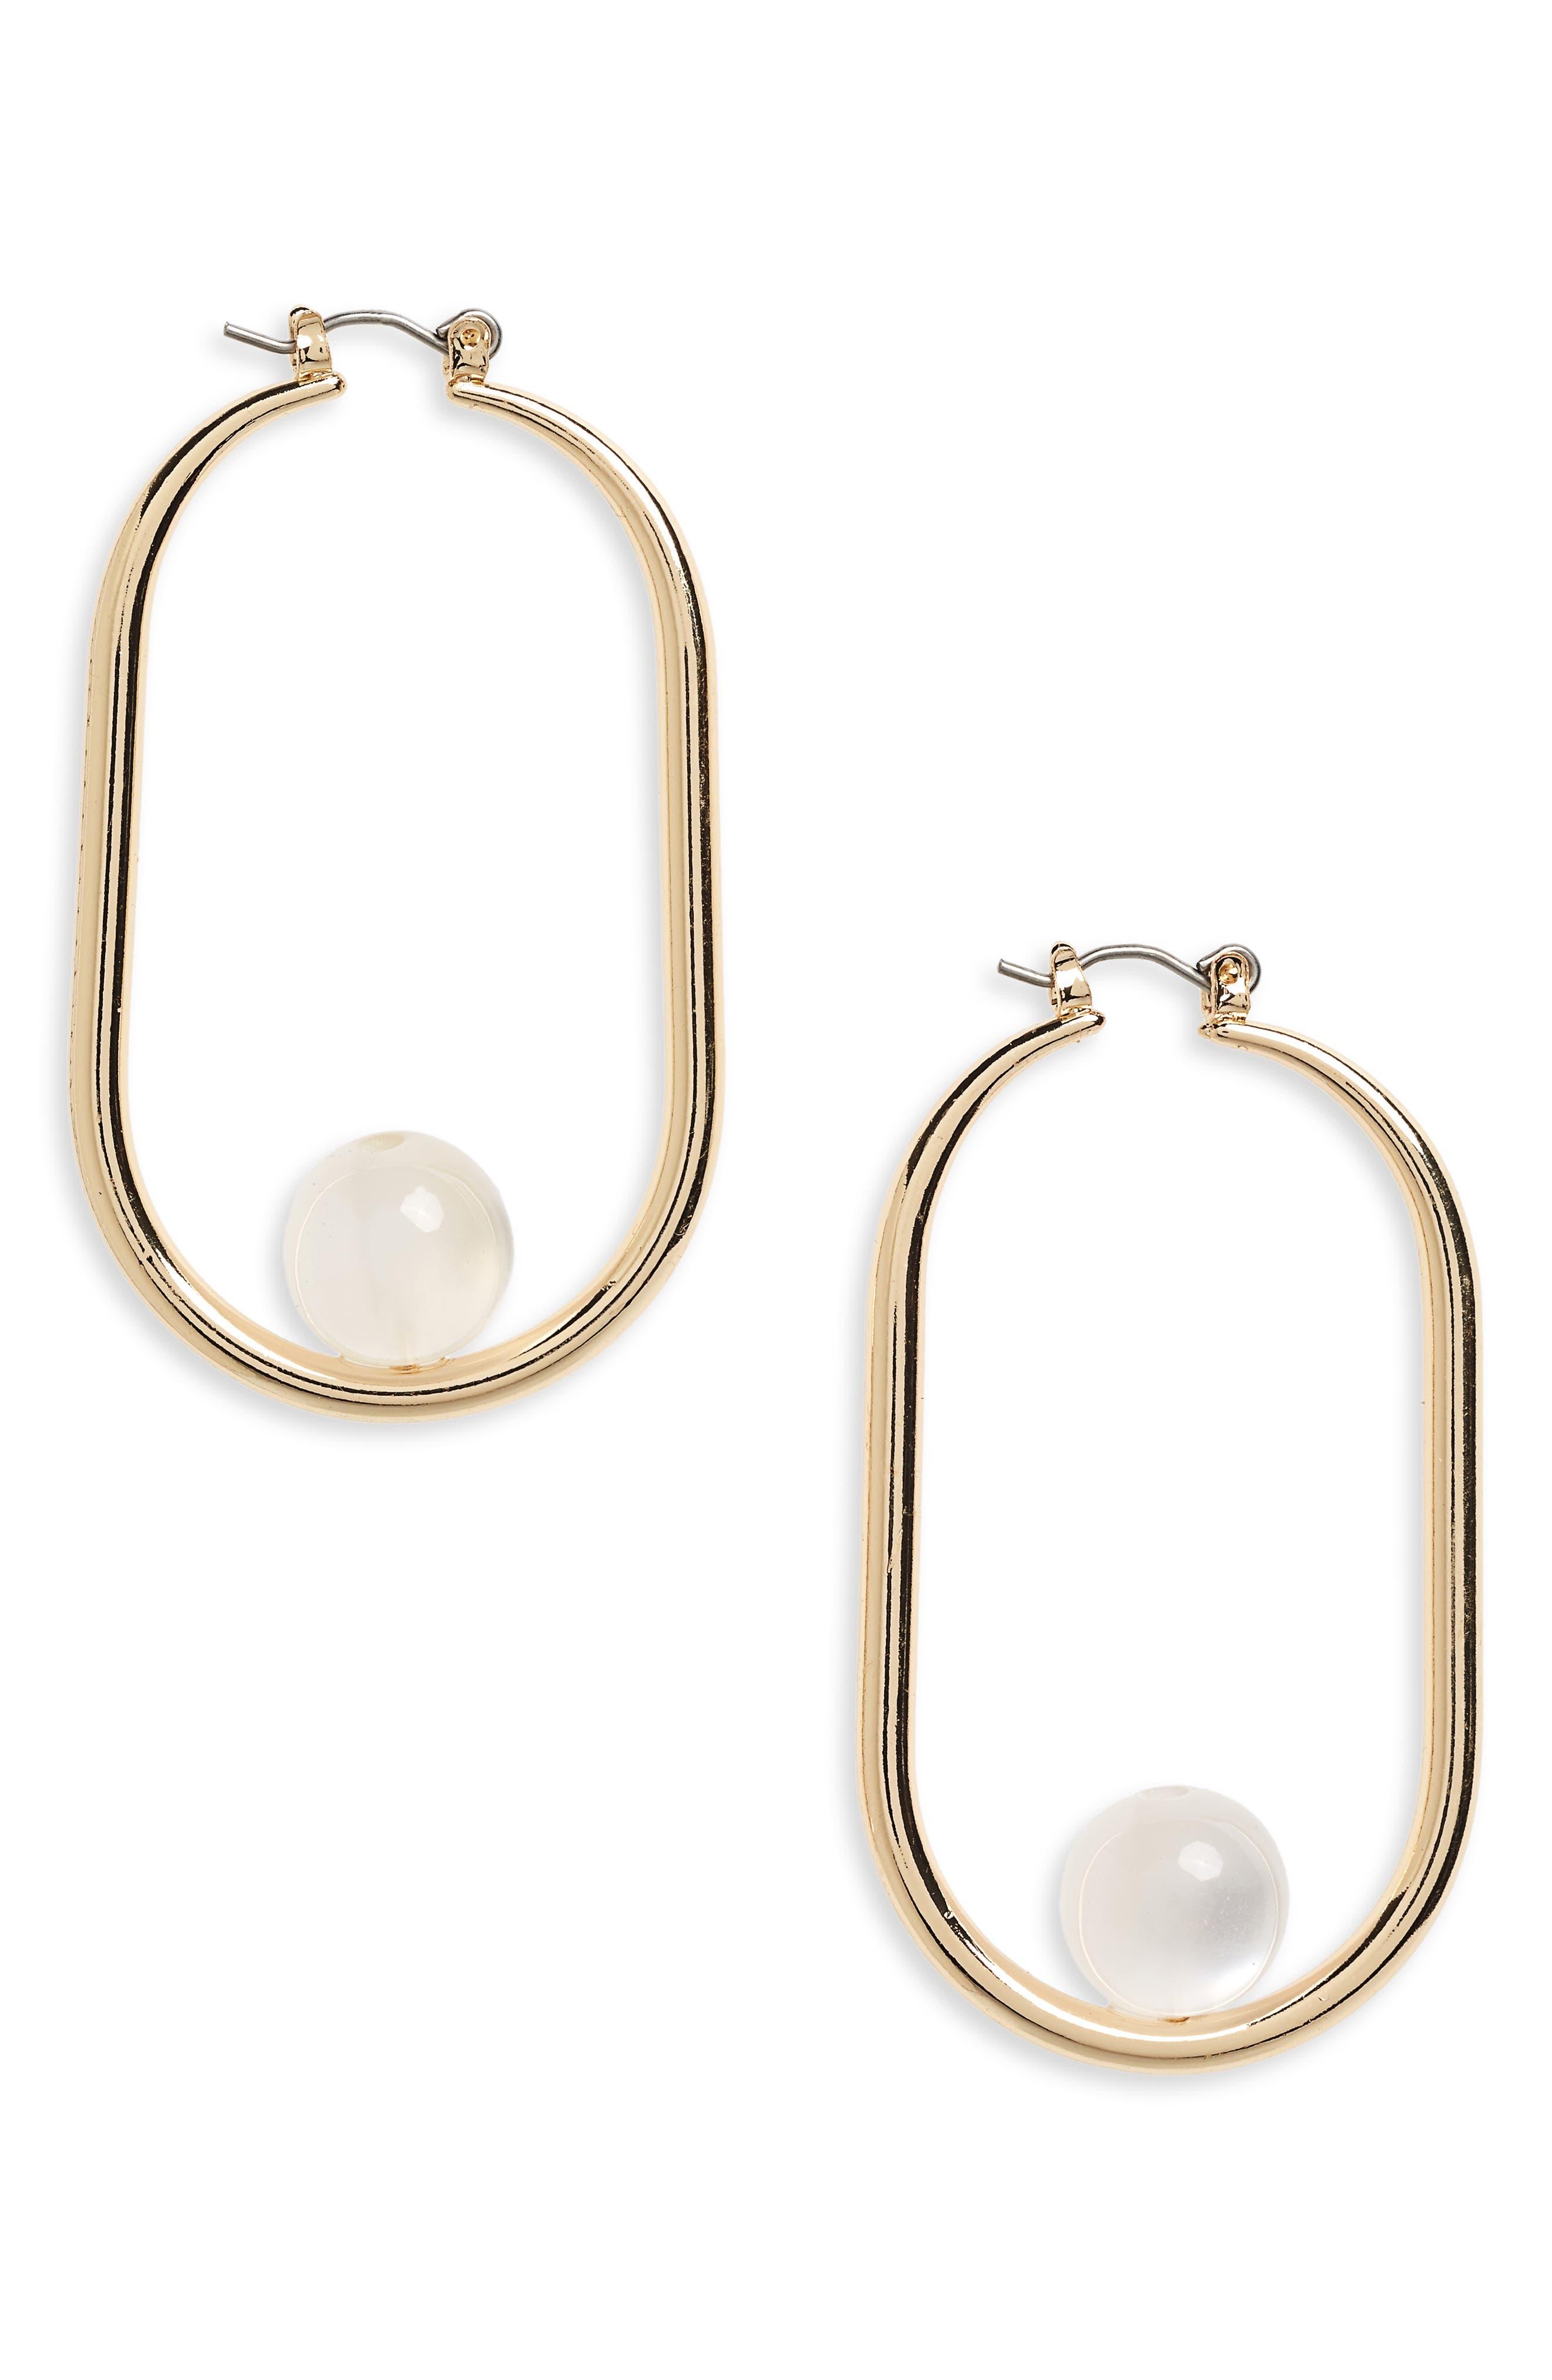 Marble Bead Hoop Earrings,                             Main thumbnail 1, color,                             710